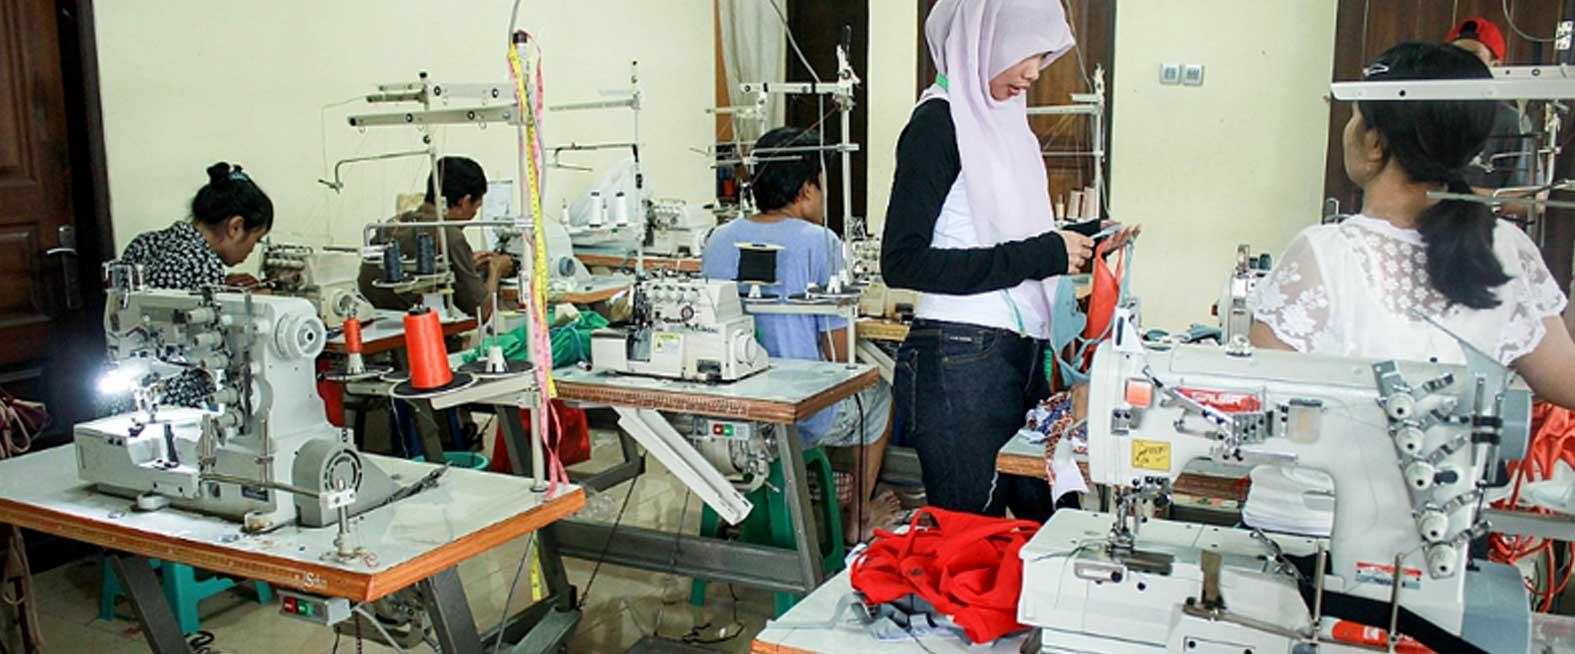 Vargare Garment & Swimwear Manufacturer Bali